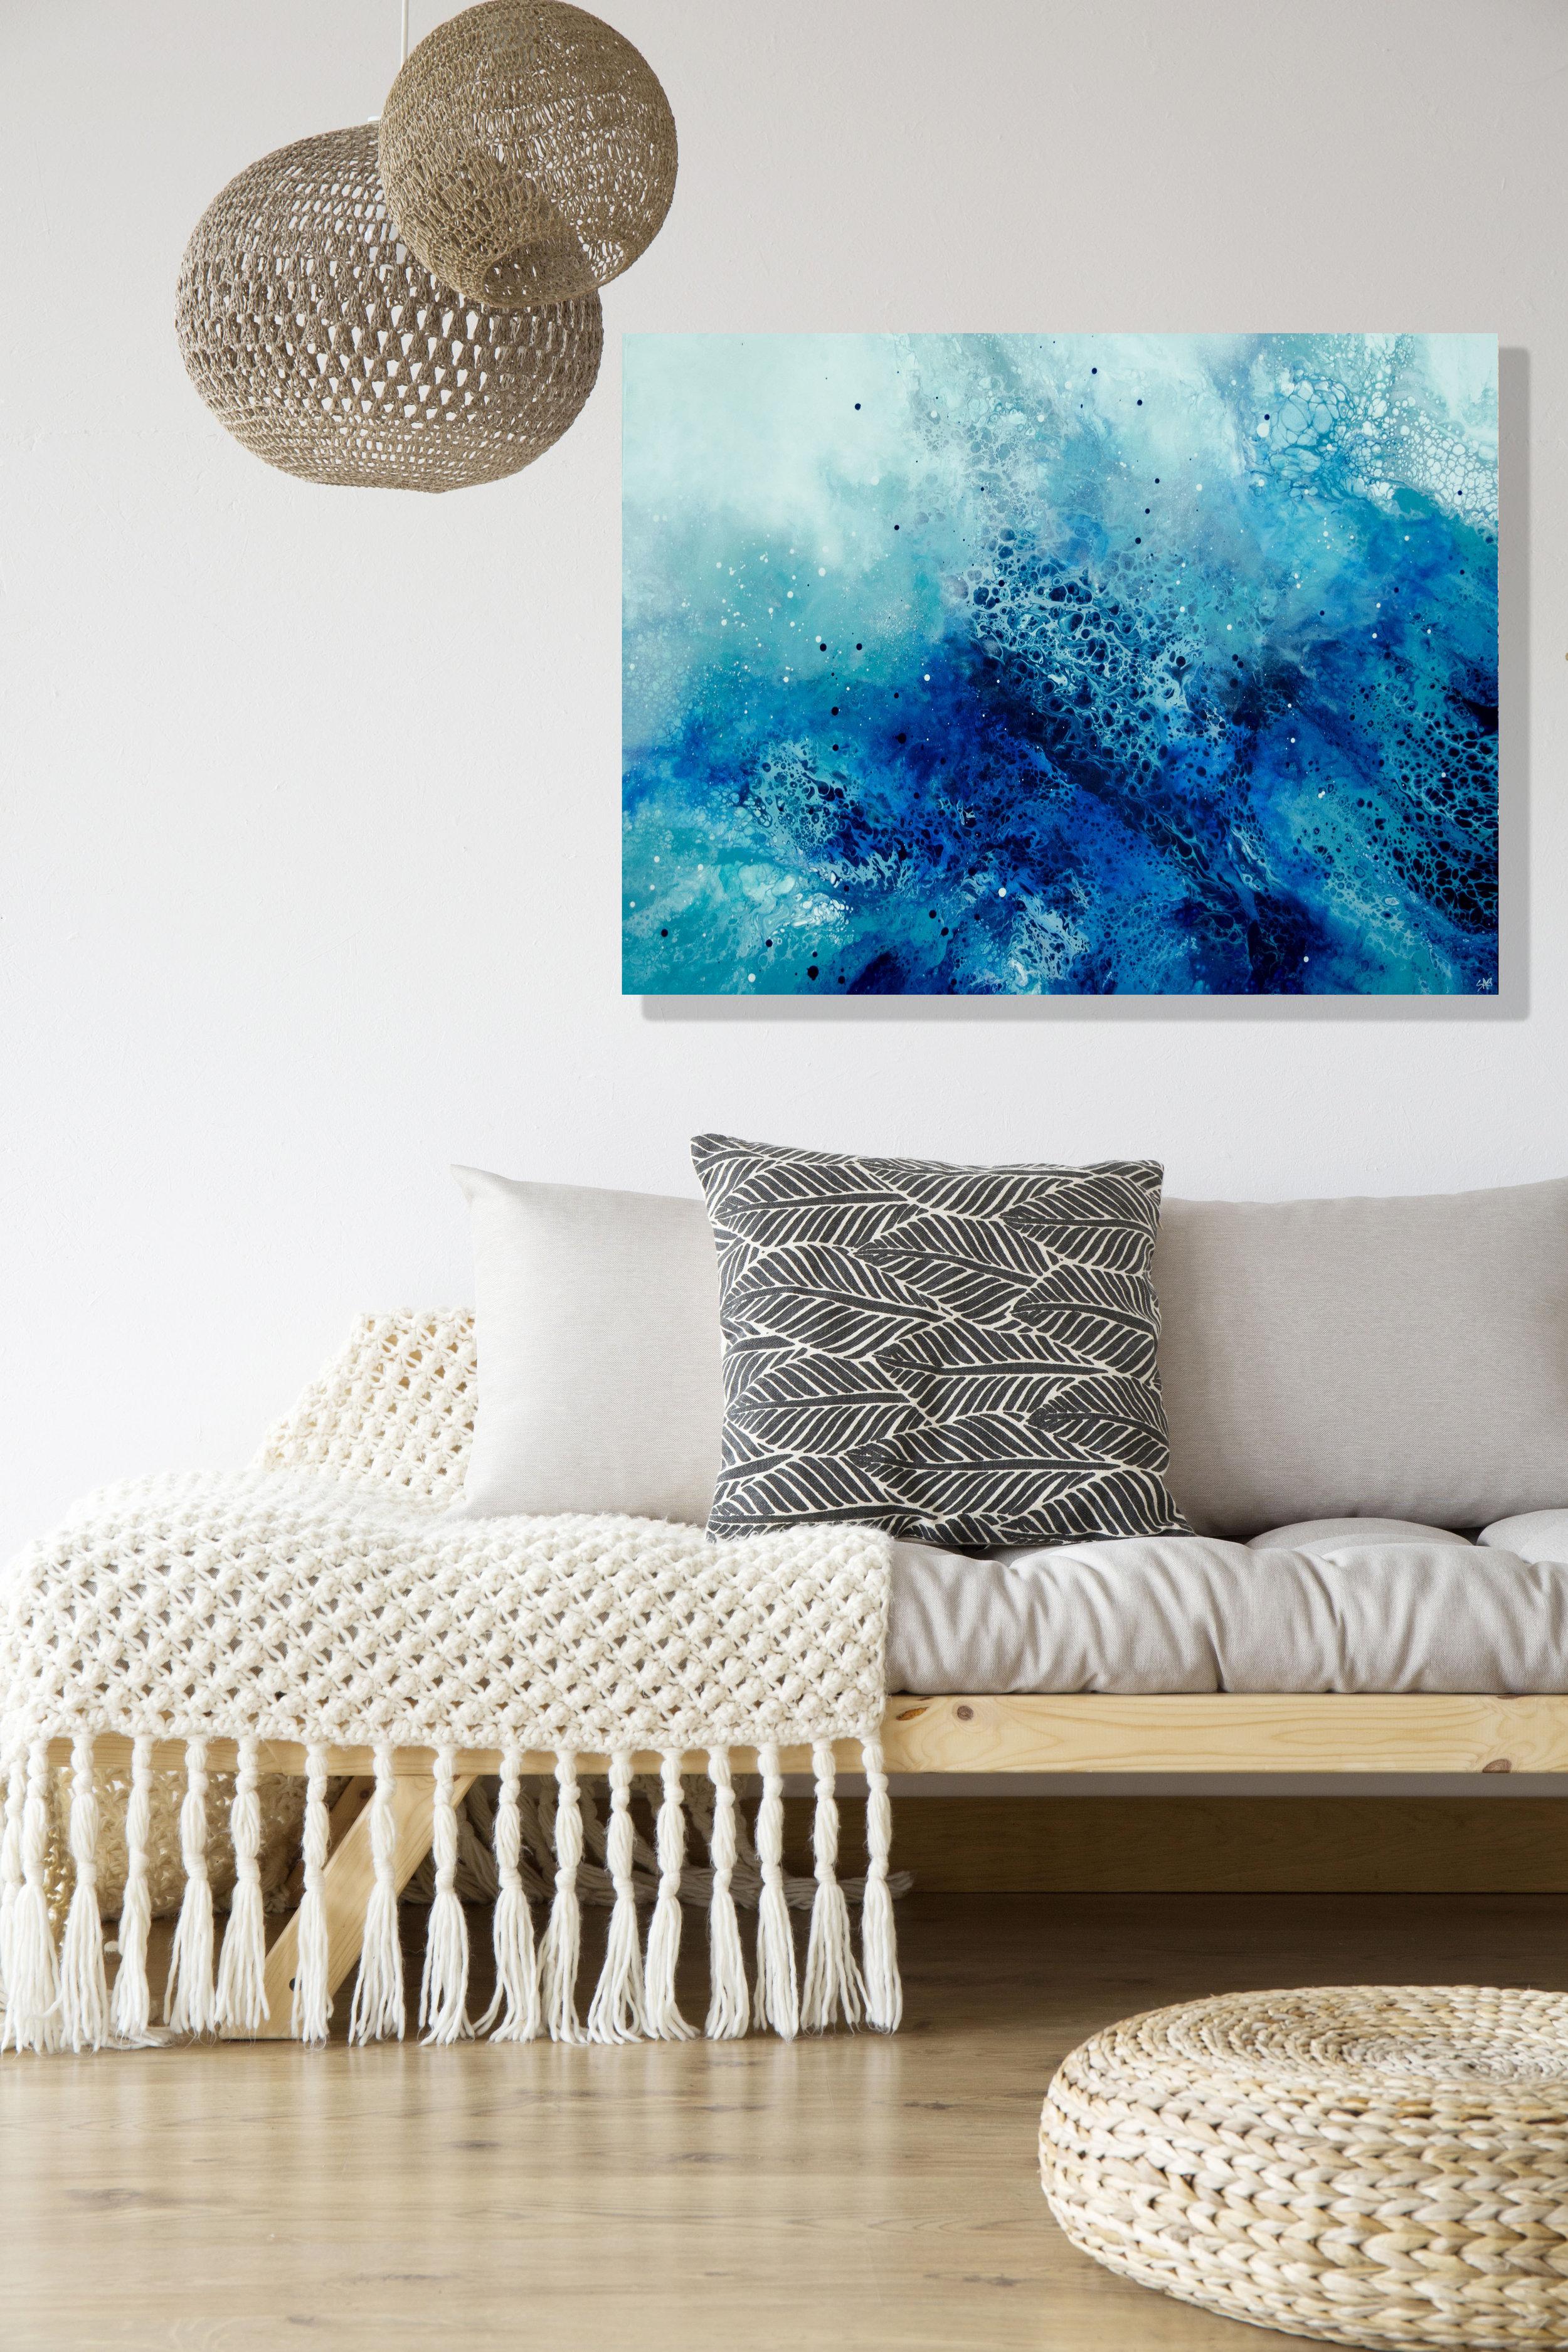 Magec/ 2019/ 24x36x1.25/Fluid Acrylic and Atlantic Ocean Water on Canvas/ for sale/     CONTACT BoJu Art Gallery    /